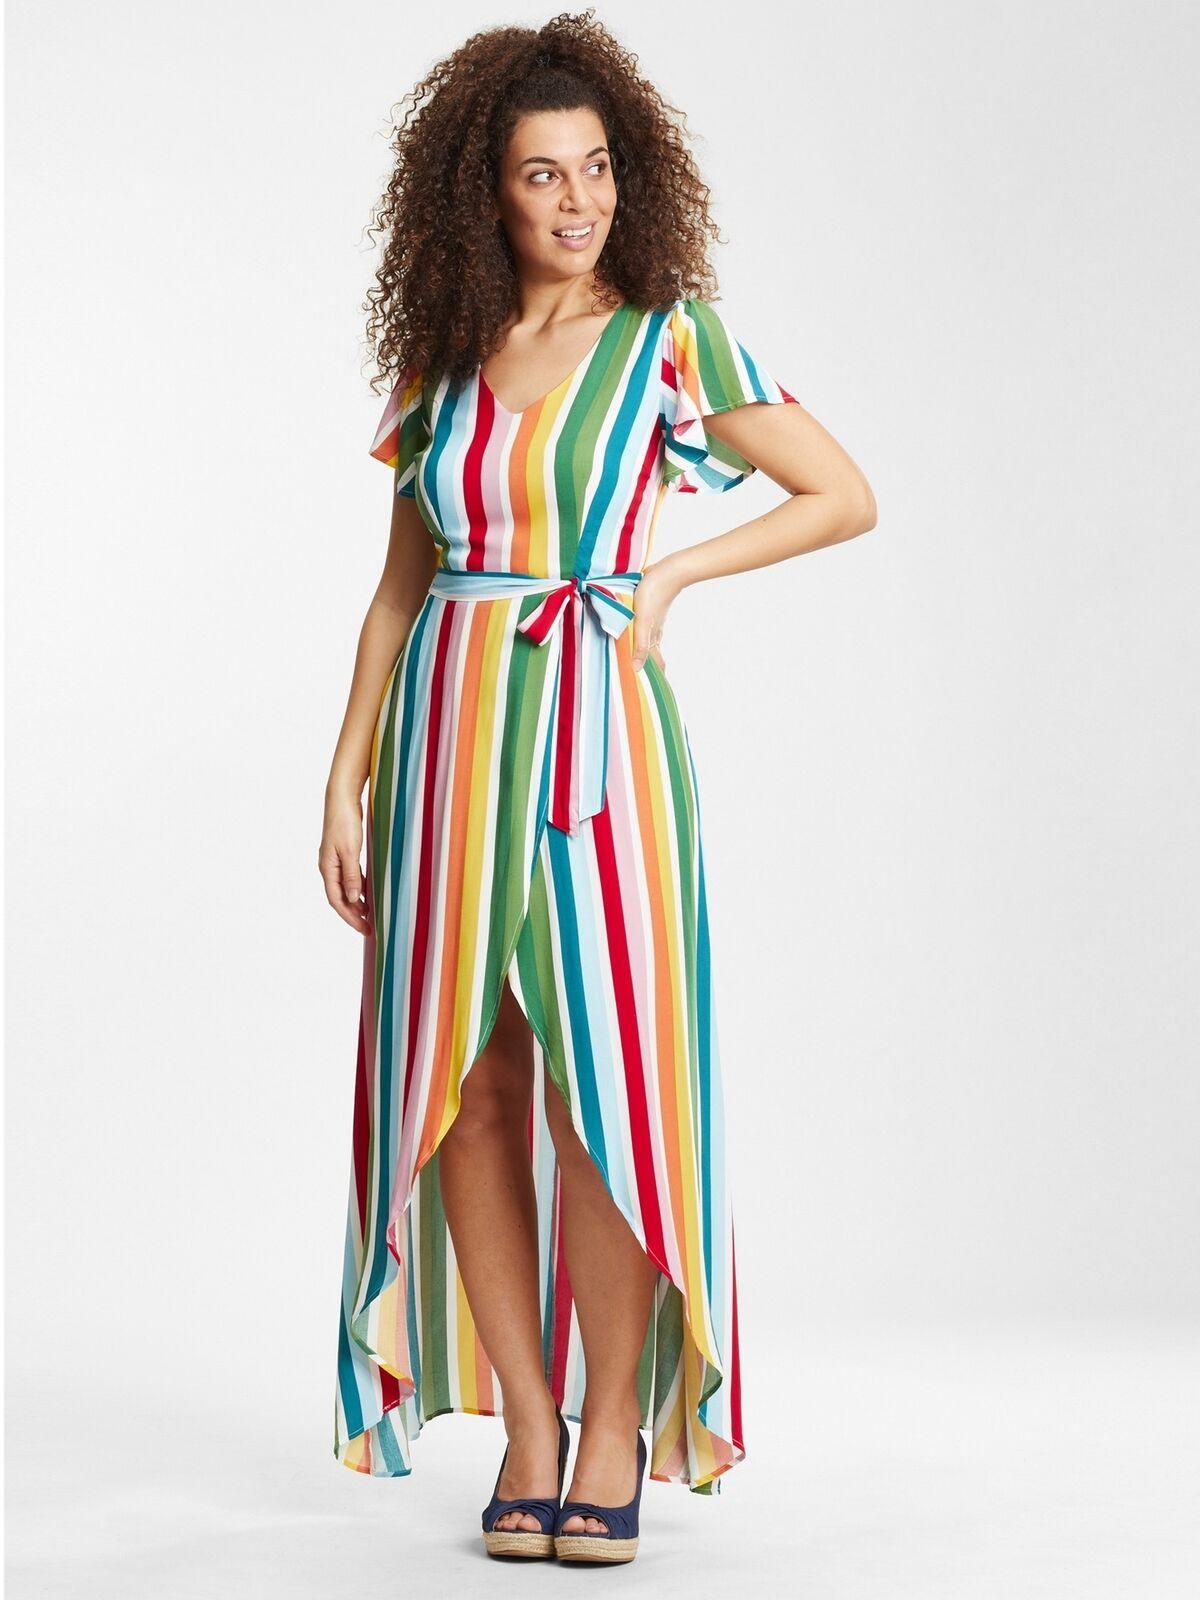 Collectif X Modcloth Sunny Rainbow Twin Stripe Maxi Dress Multi UK8